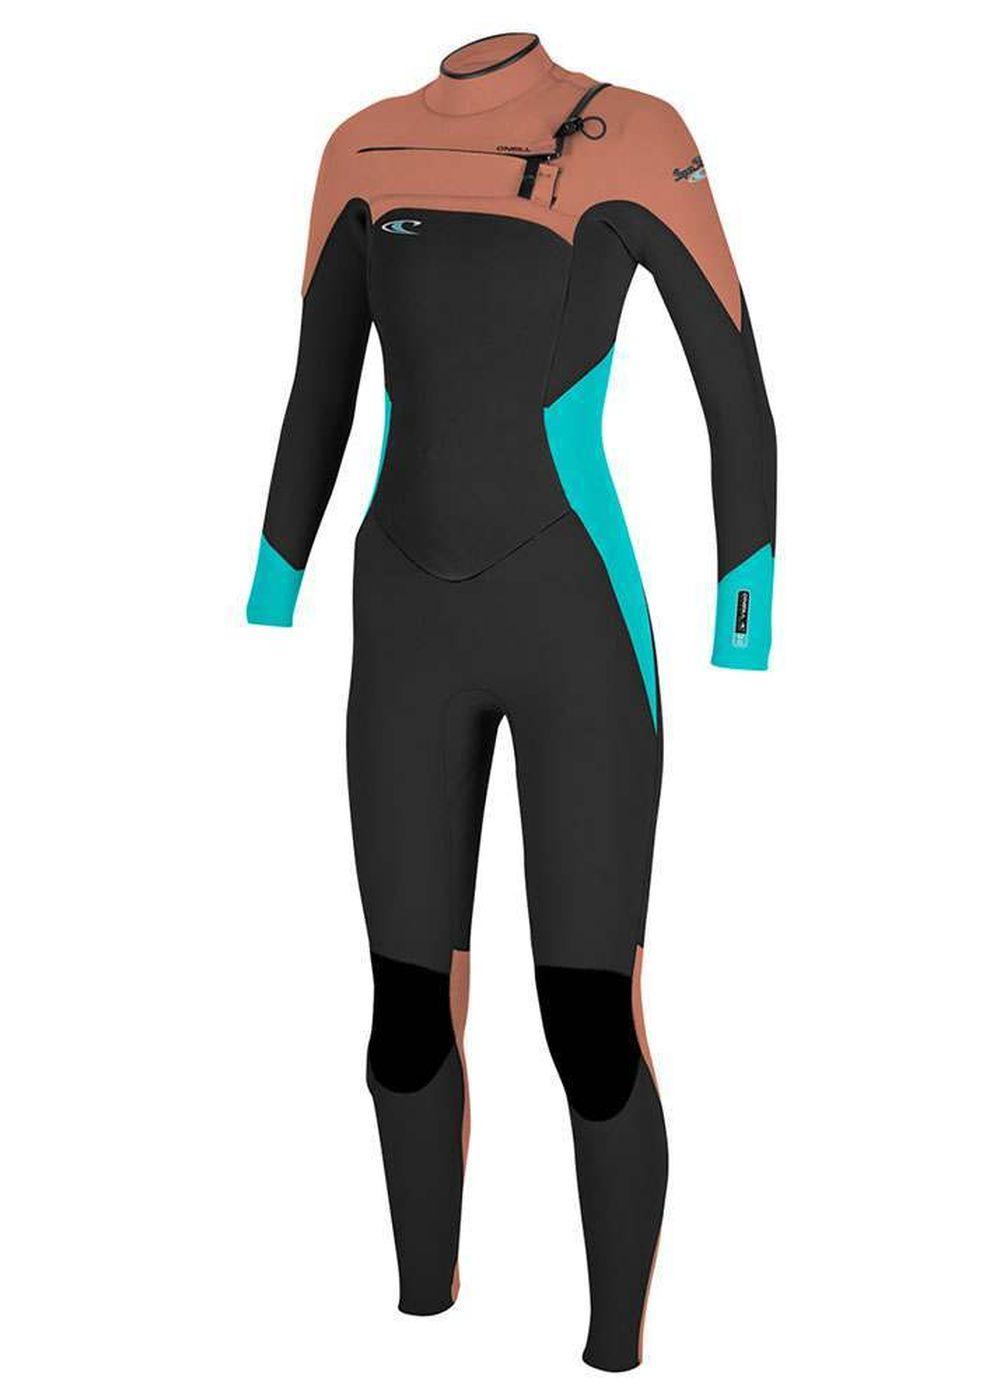 Oneill Womens Superfreak 4/3 Wetsuit 2017 Blk/aqu Picture